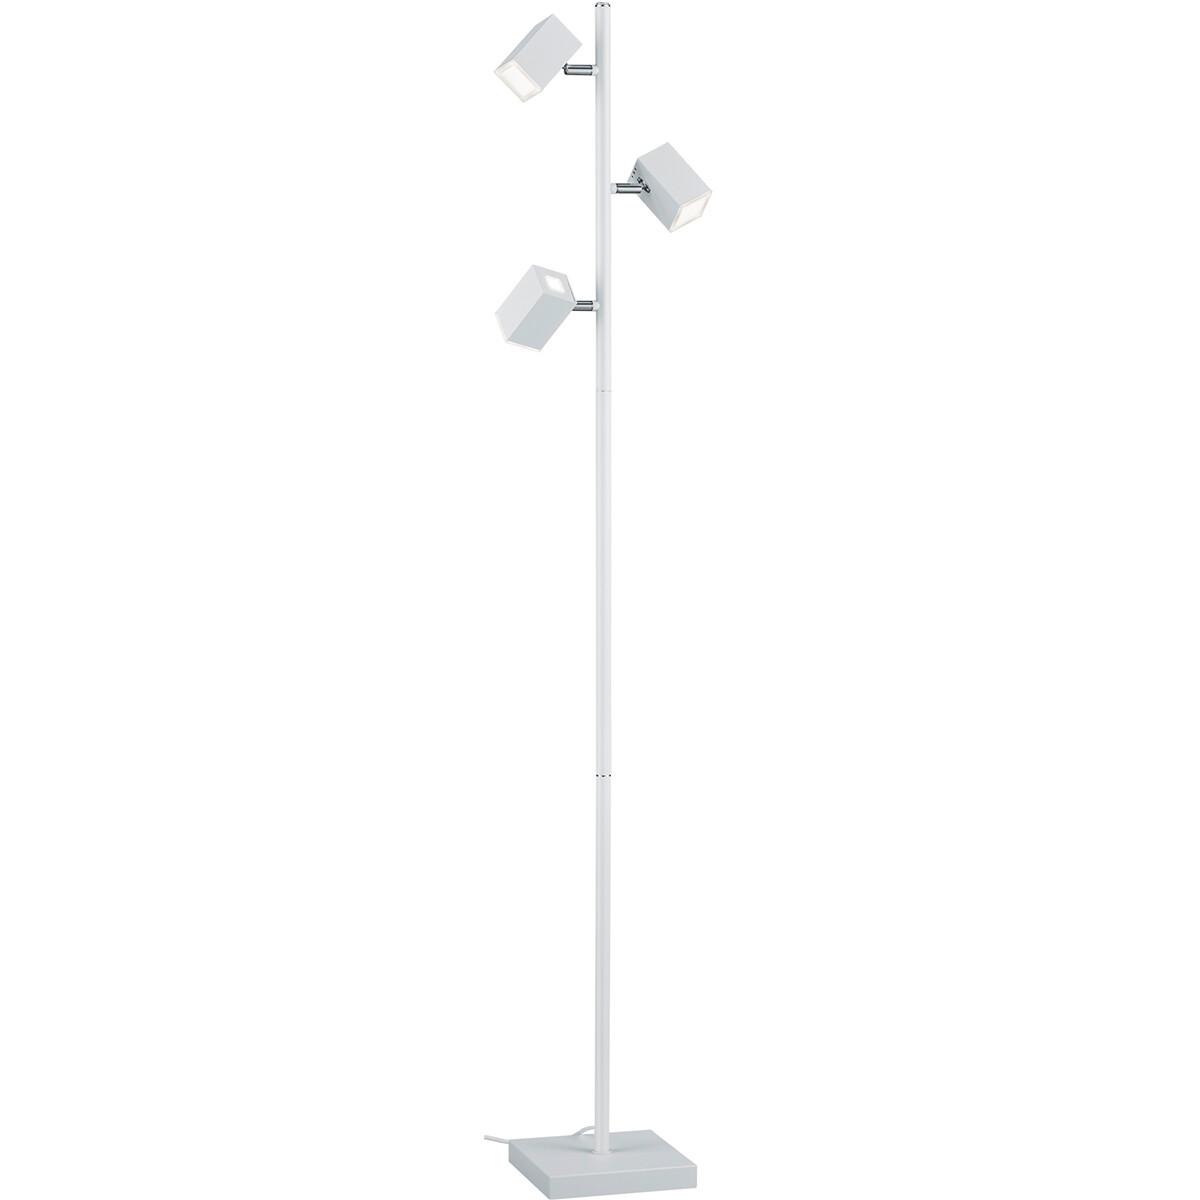 LED Vloerlamp - Trion Laginos - 12W - Warm Wit 3000K - 3-lichts - Dimbaar - Rechthoek - Mat Wit - Al